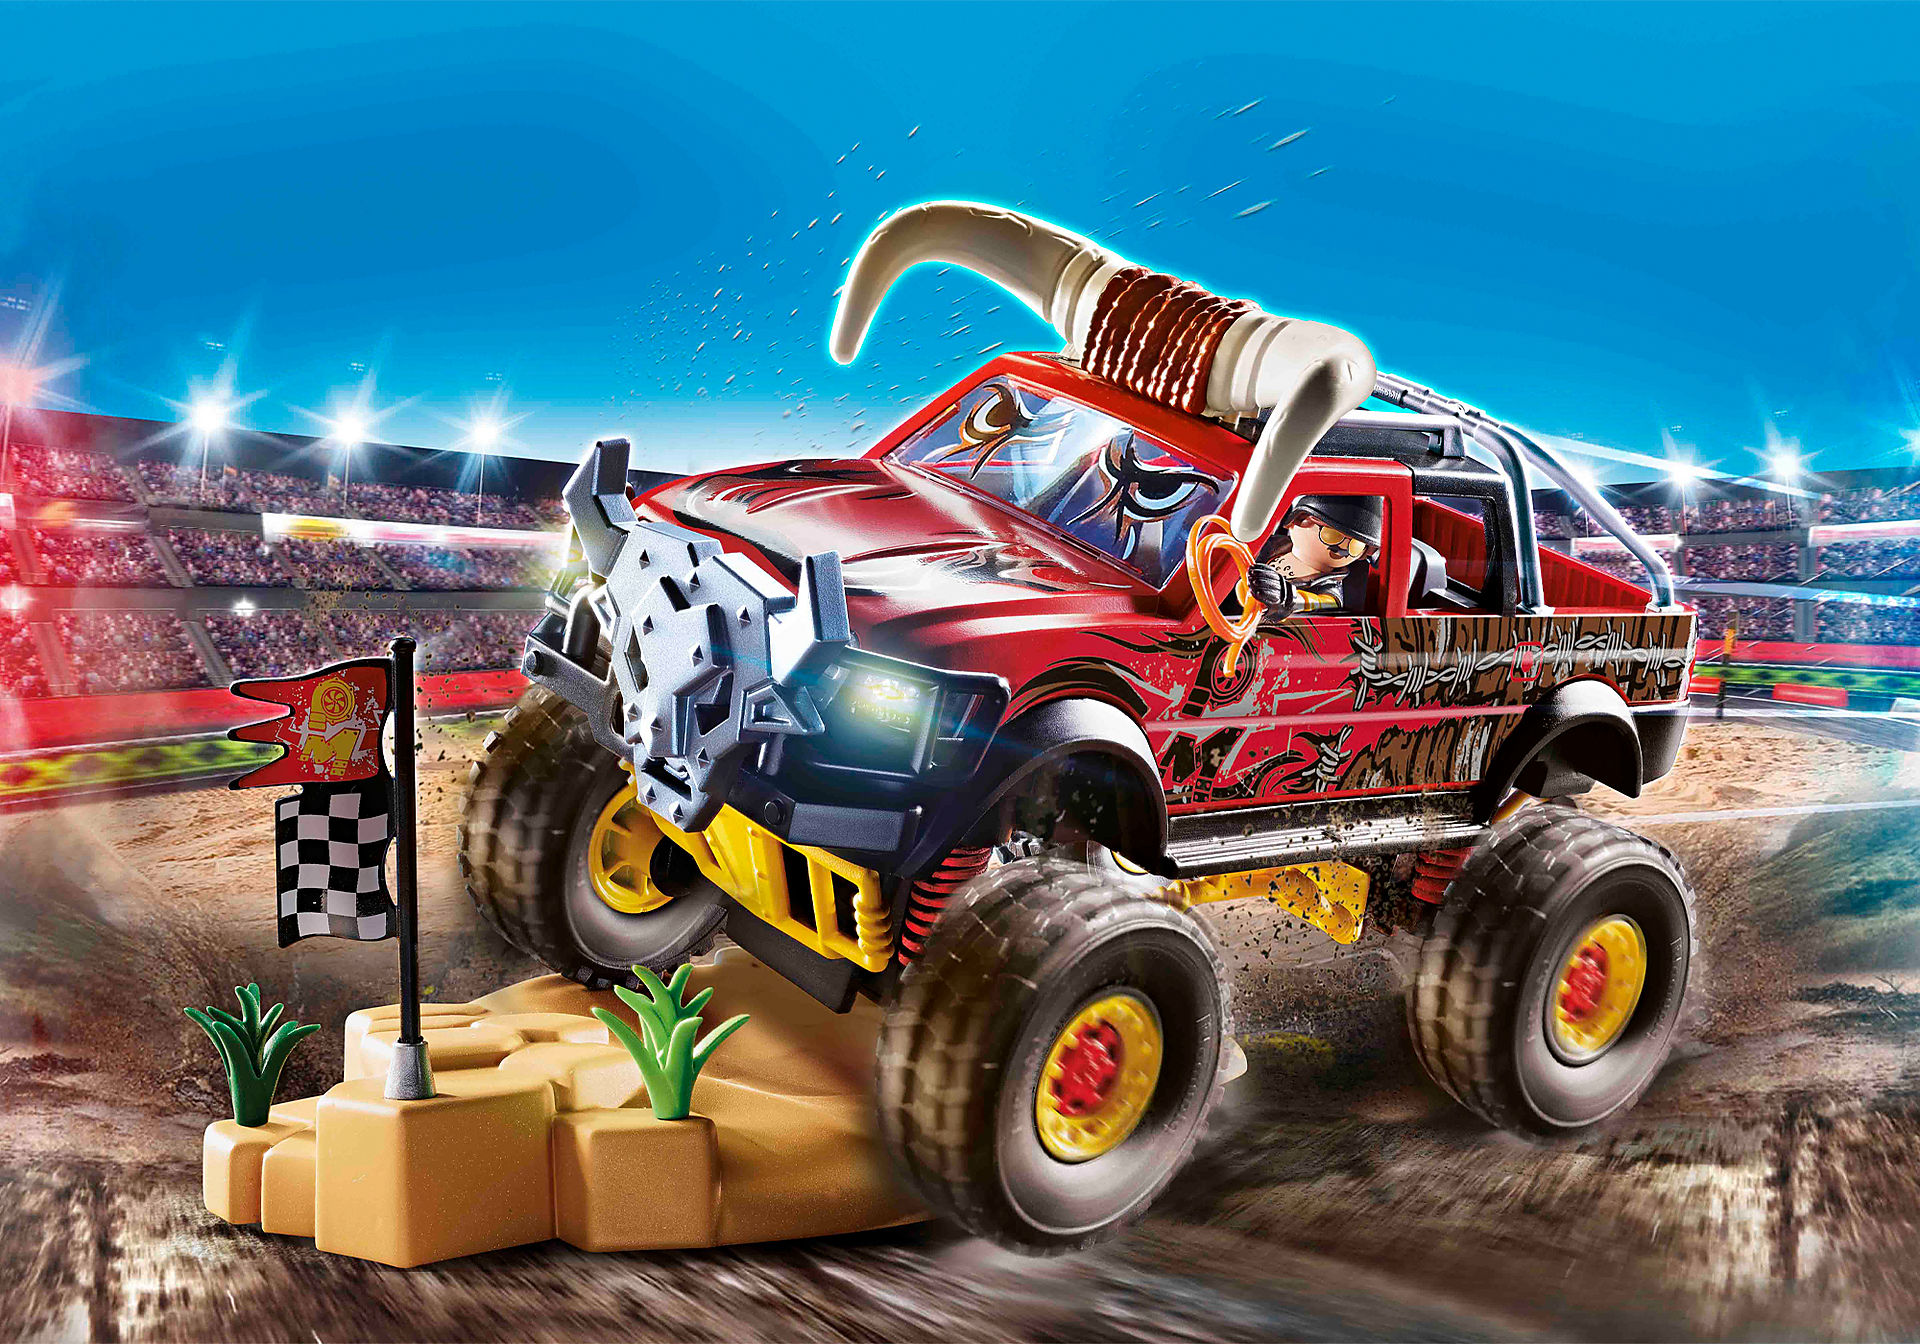 70549 Stuntshow Monster Truck Horned zoom image1